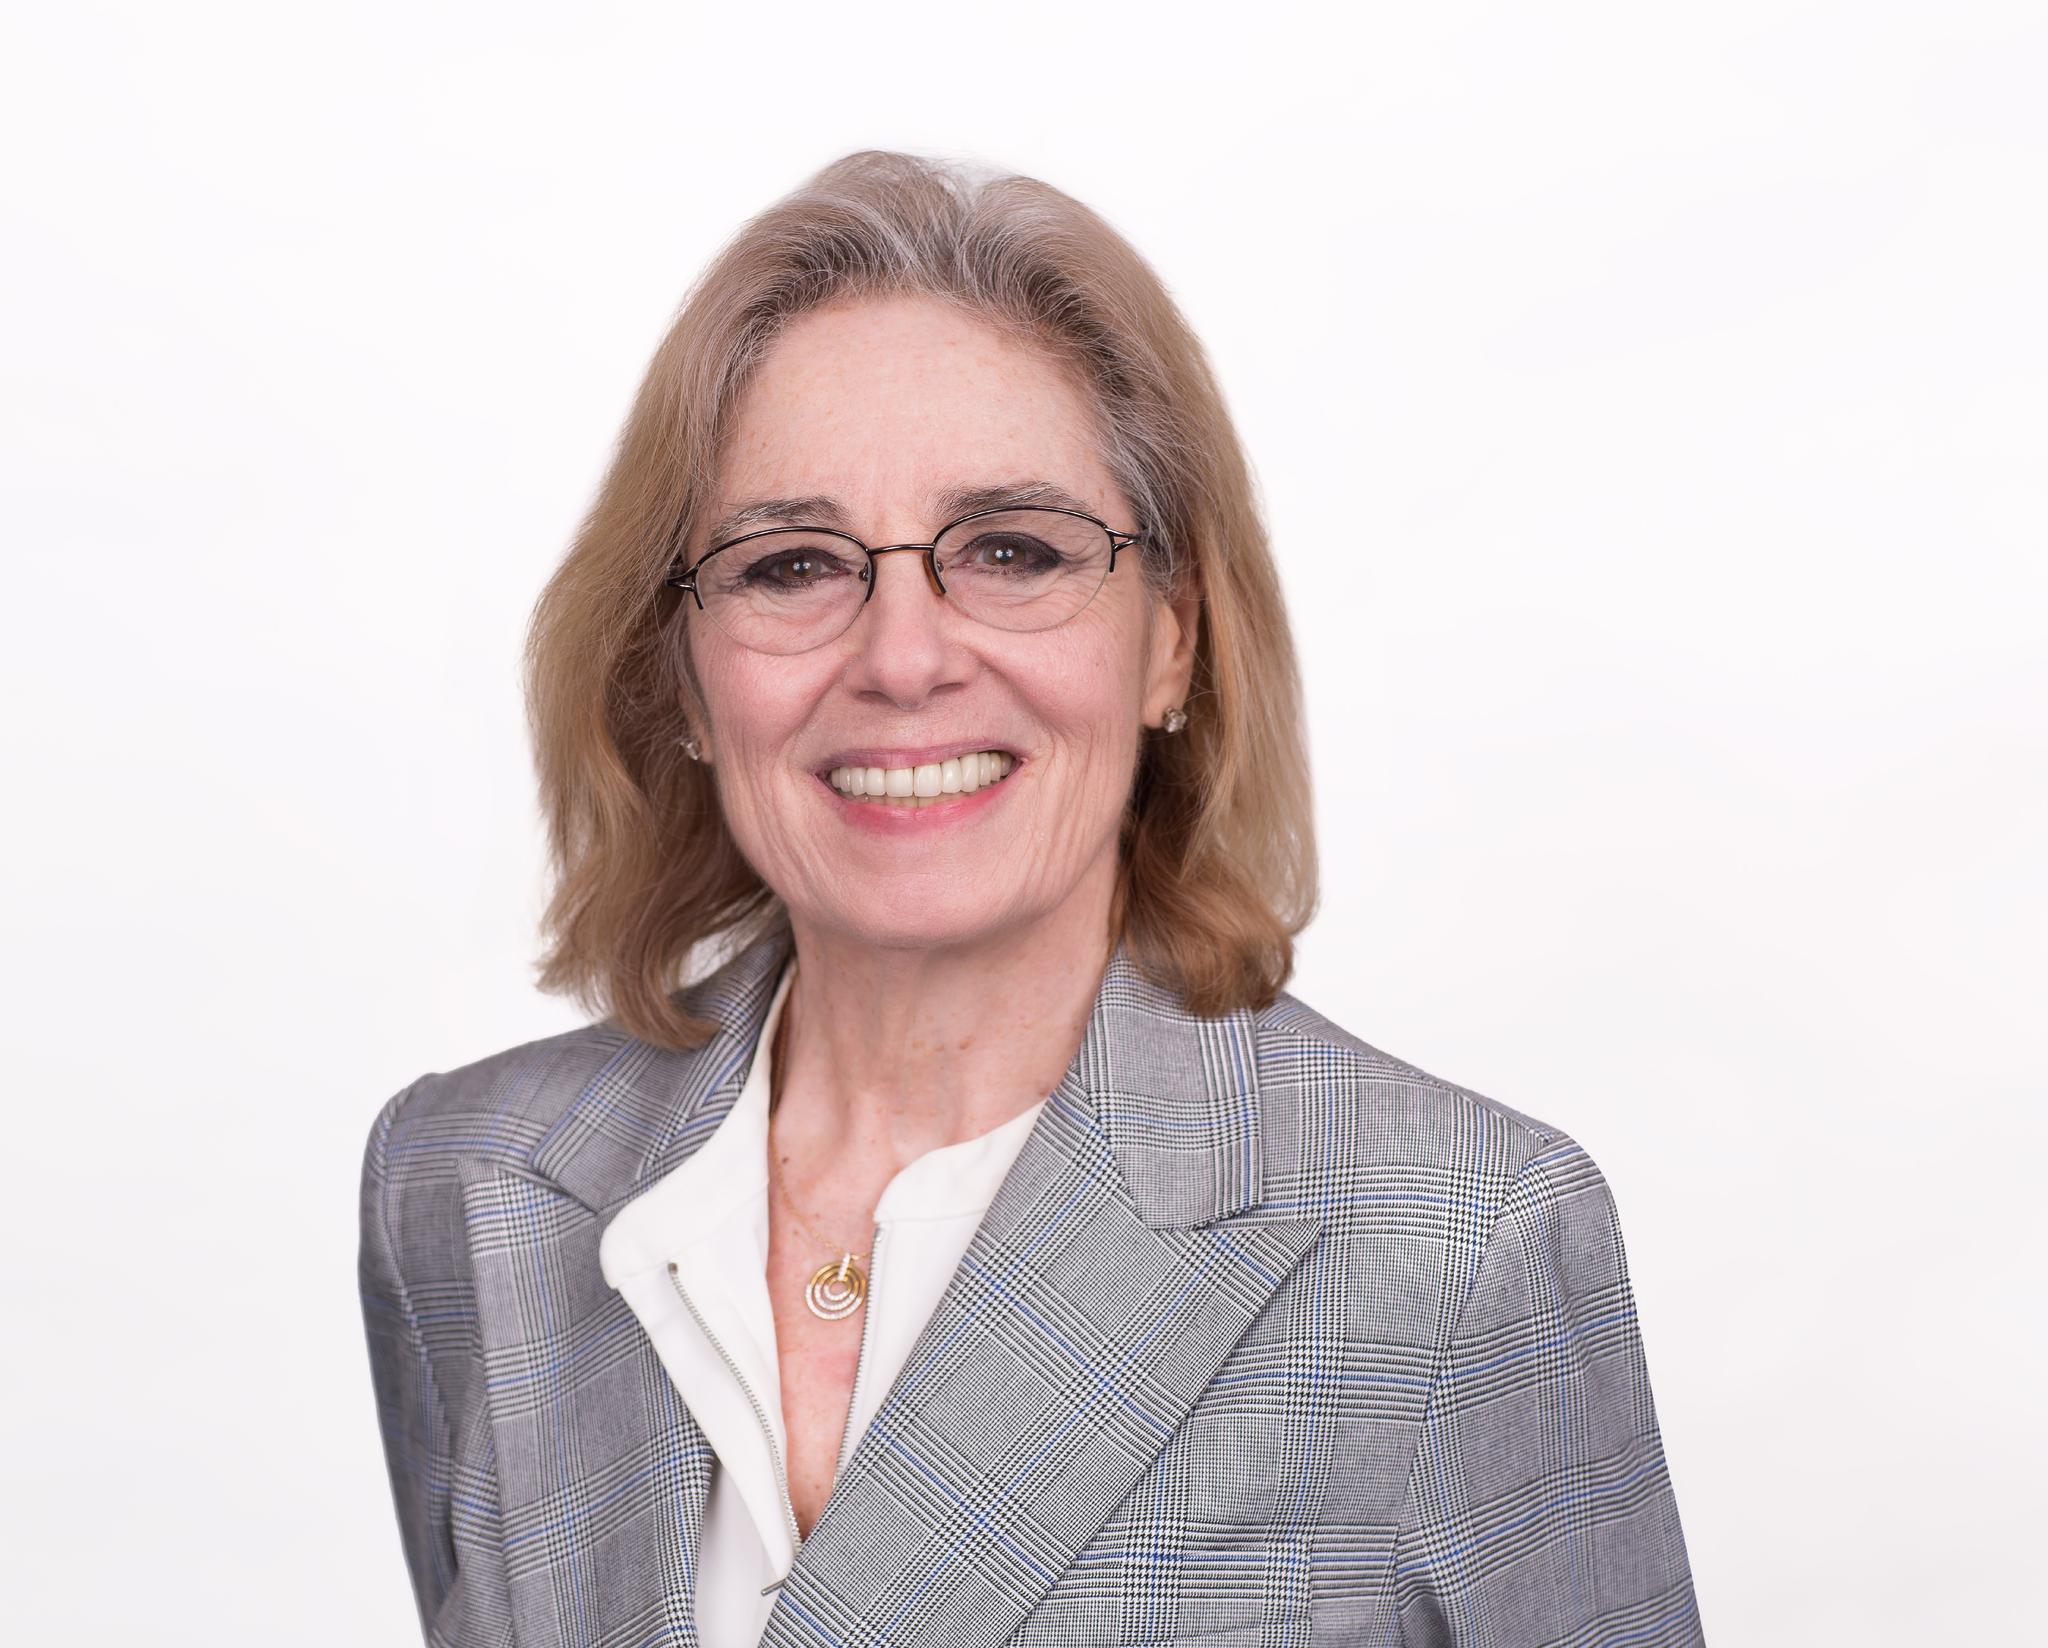 Barbara A. Res